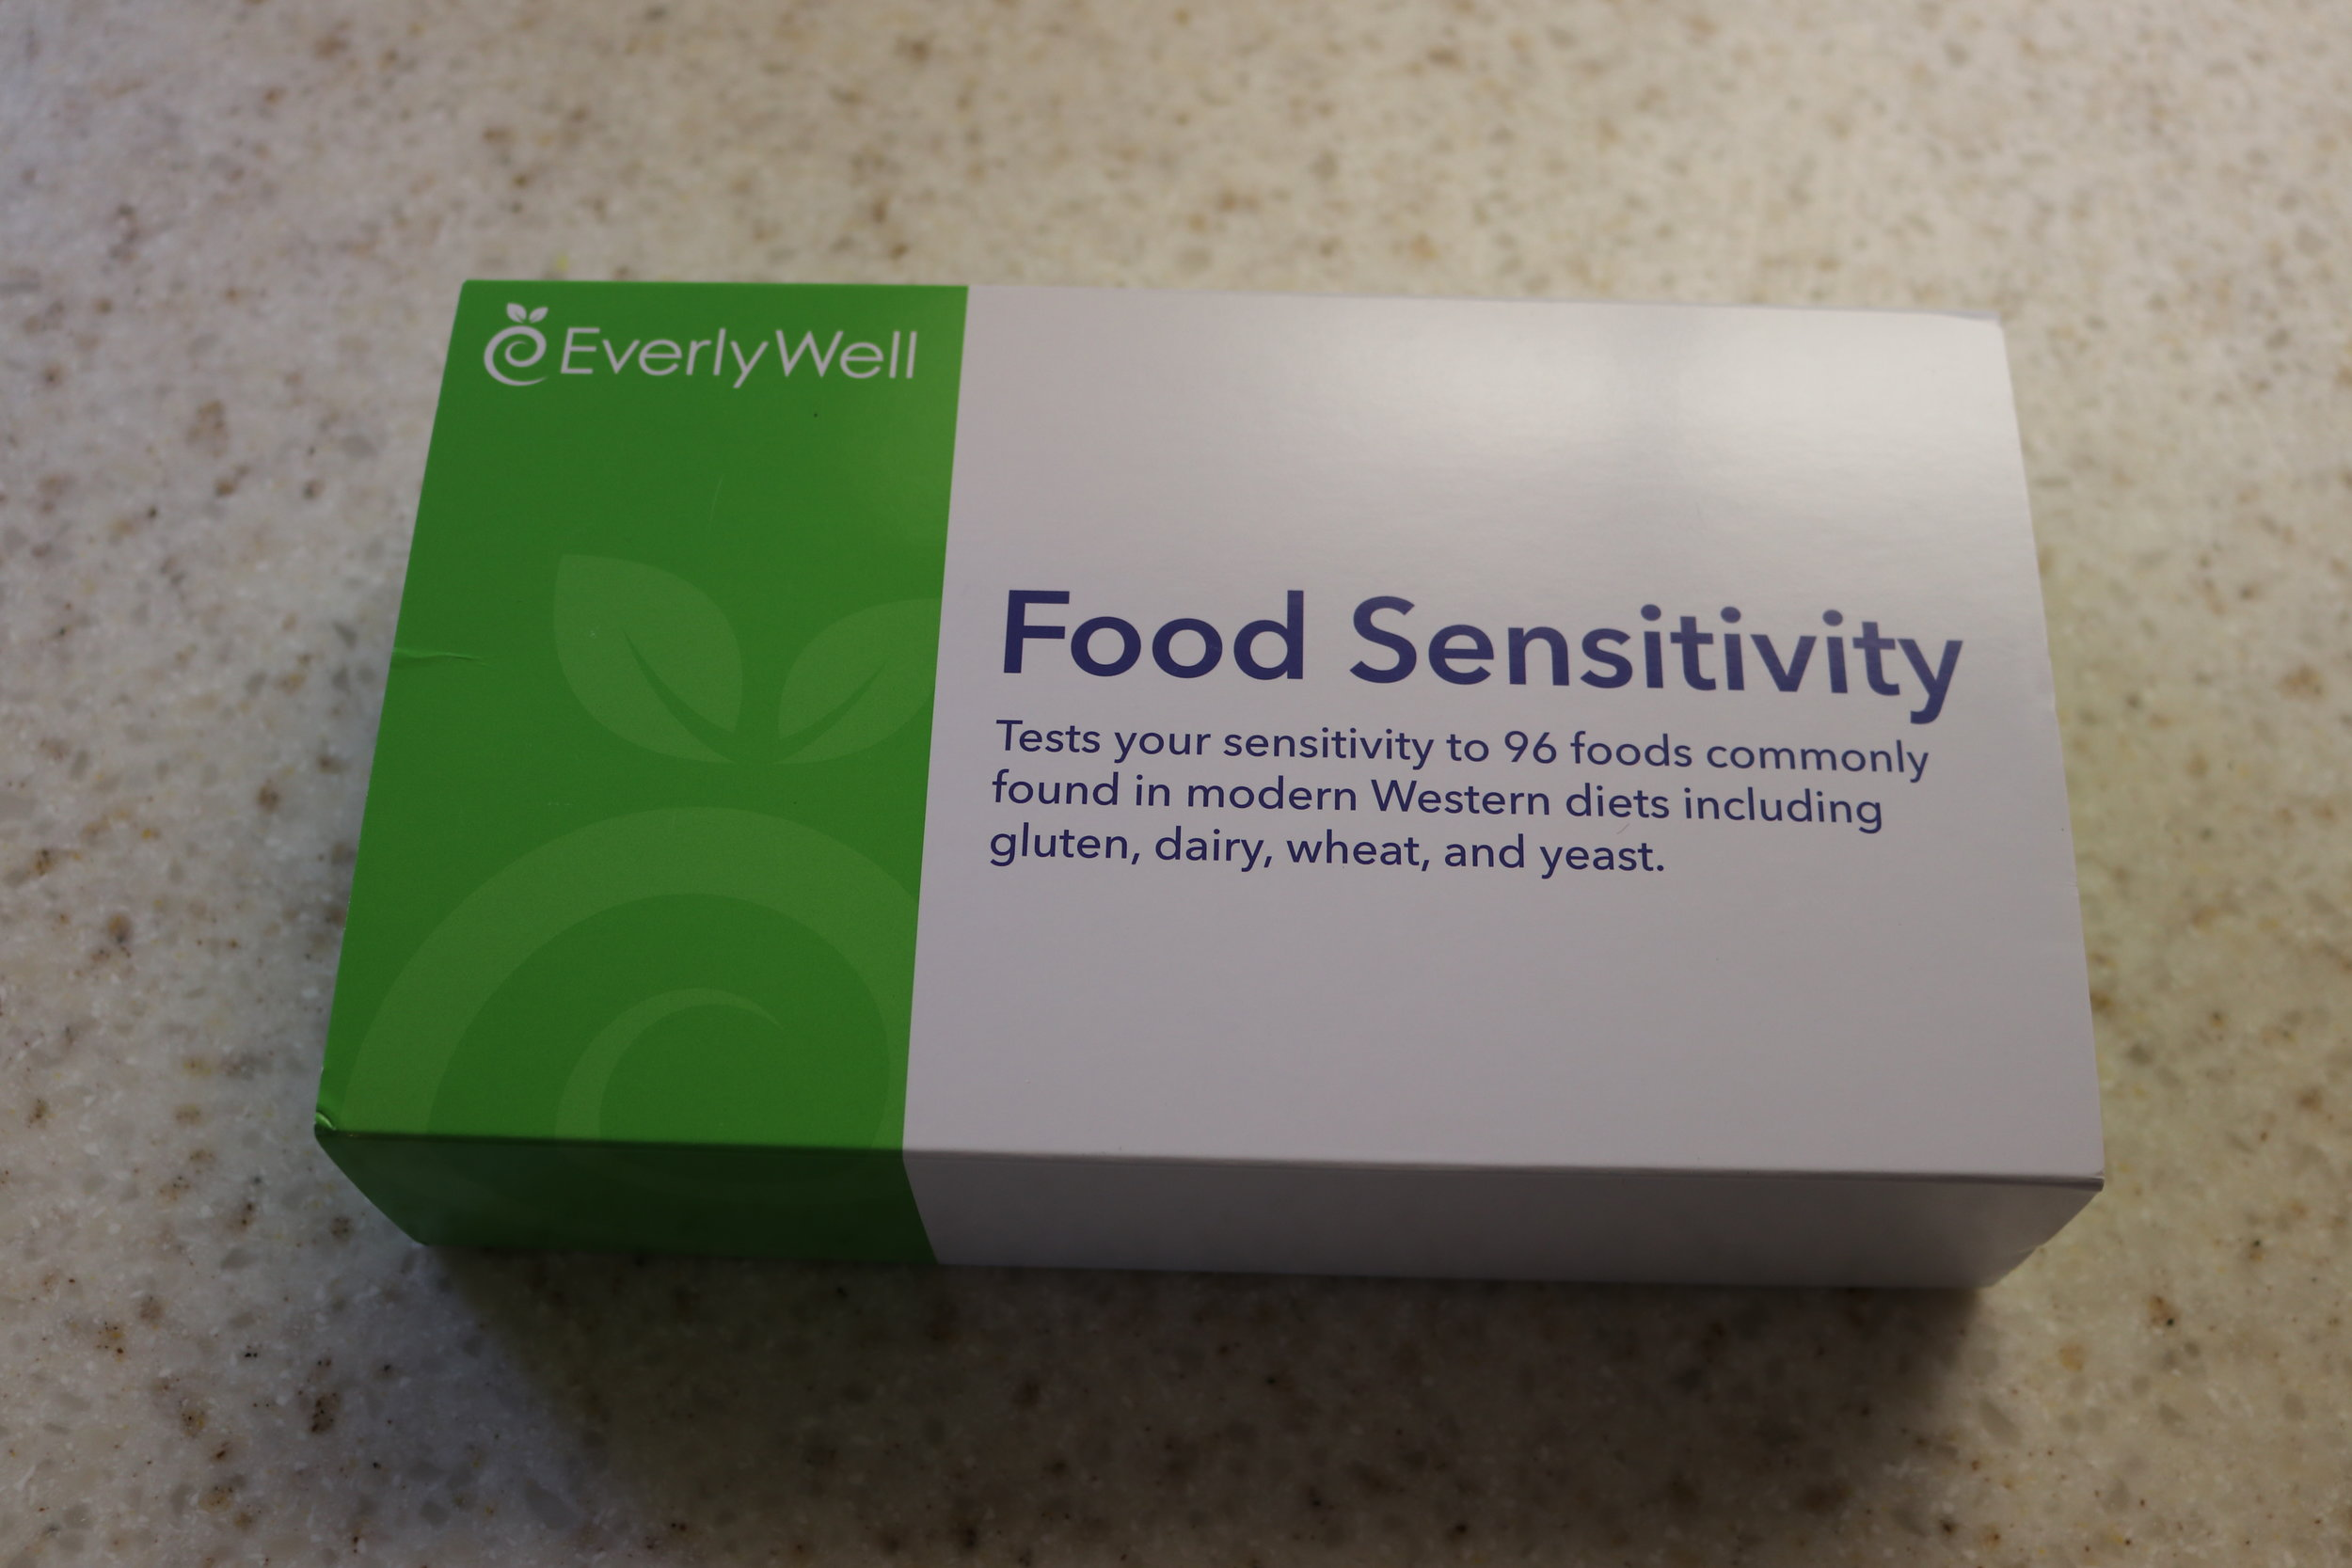 Everlywell Food Sensitivity Kit - whatthegirlssay.com